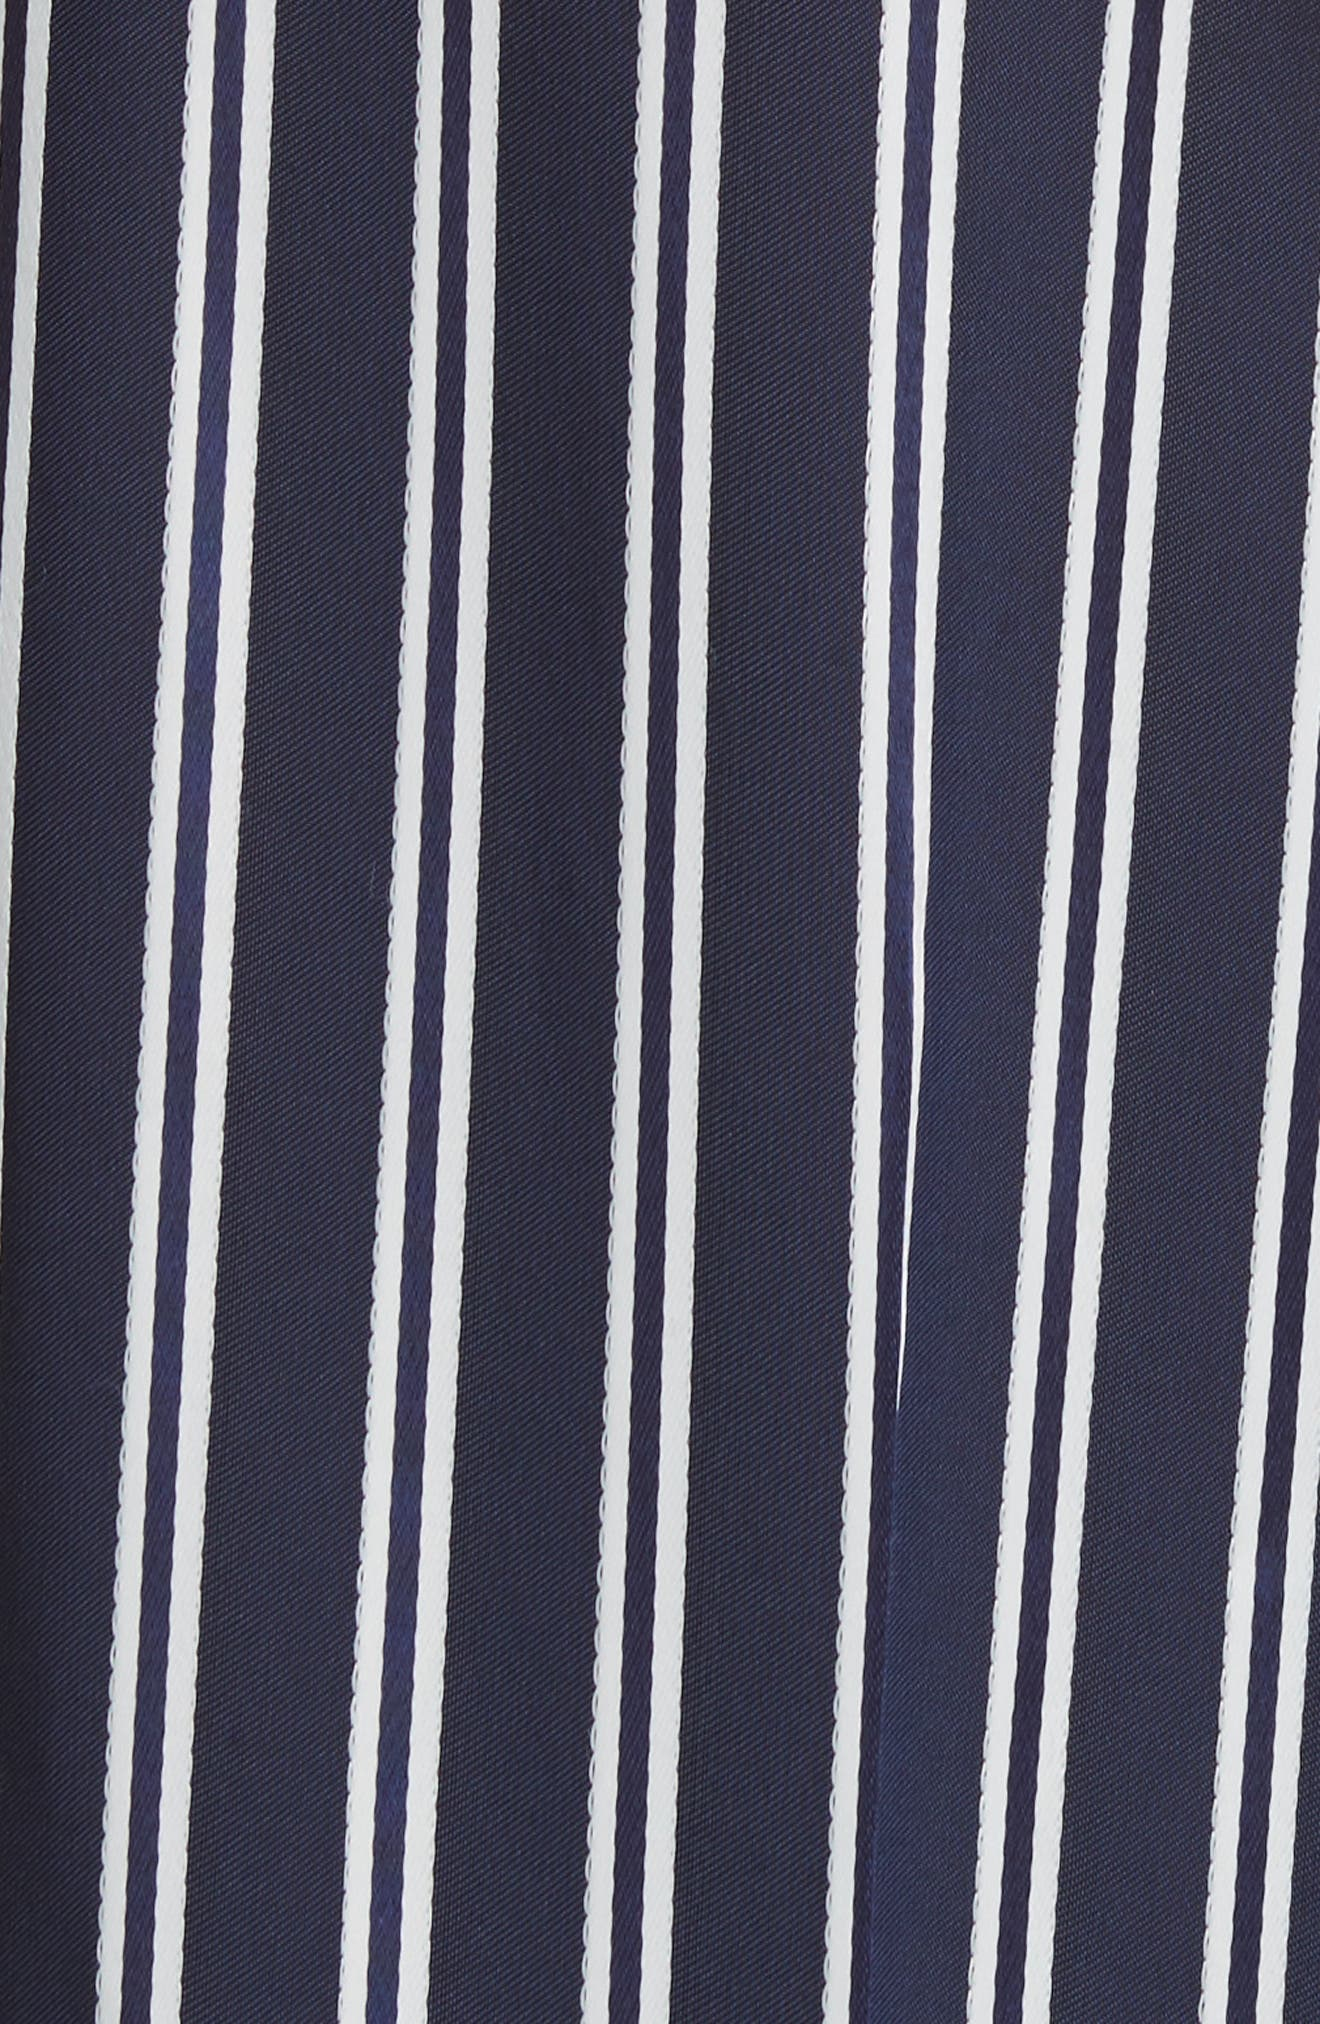 Diane von Furstenberg Stripe Palazzo Pants,                             Alternate thumbnail 5, color,                             Alexander Navy/ Ivory